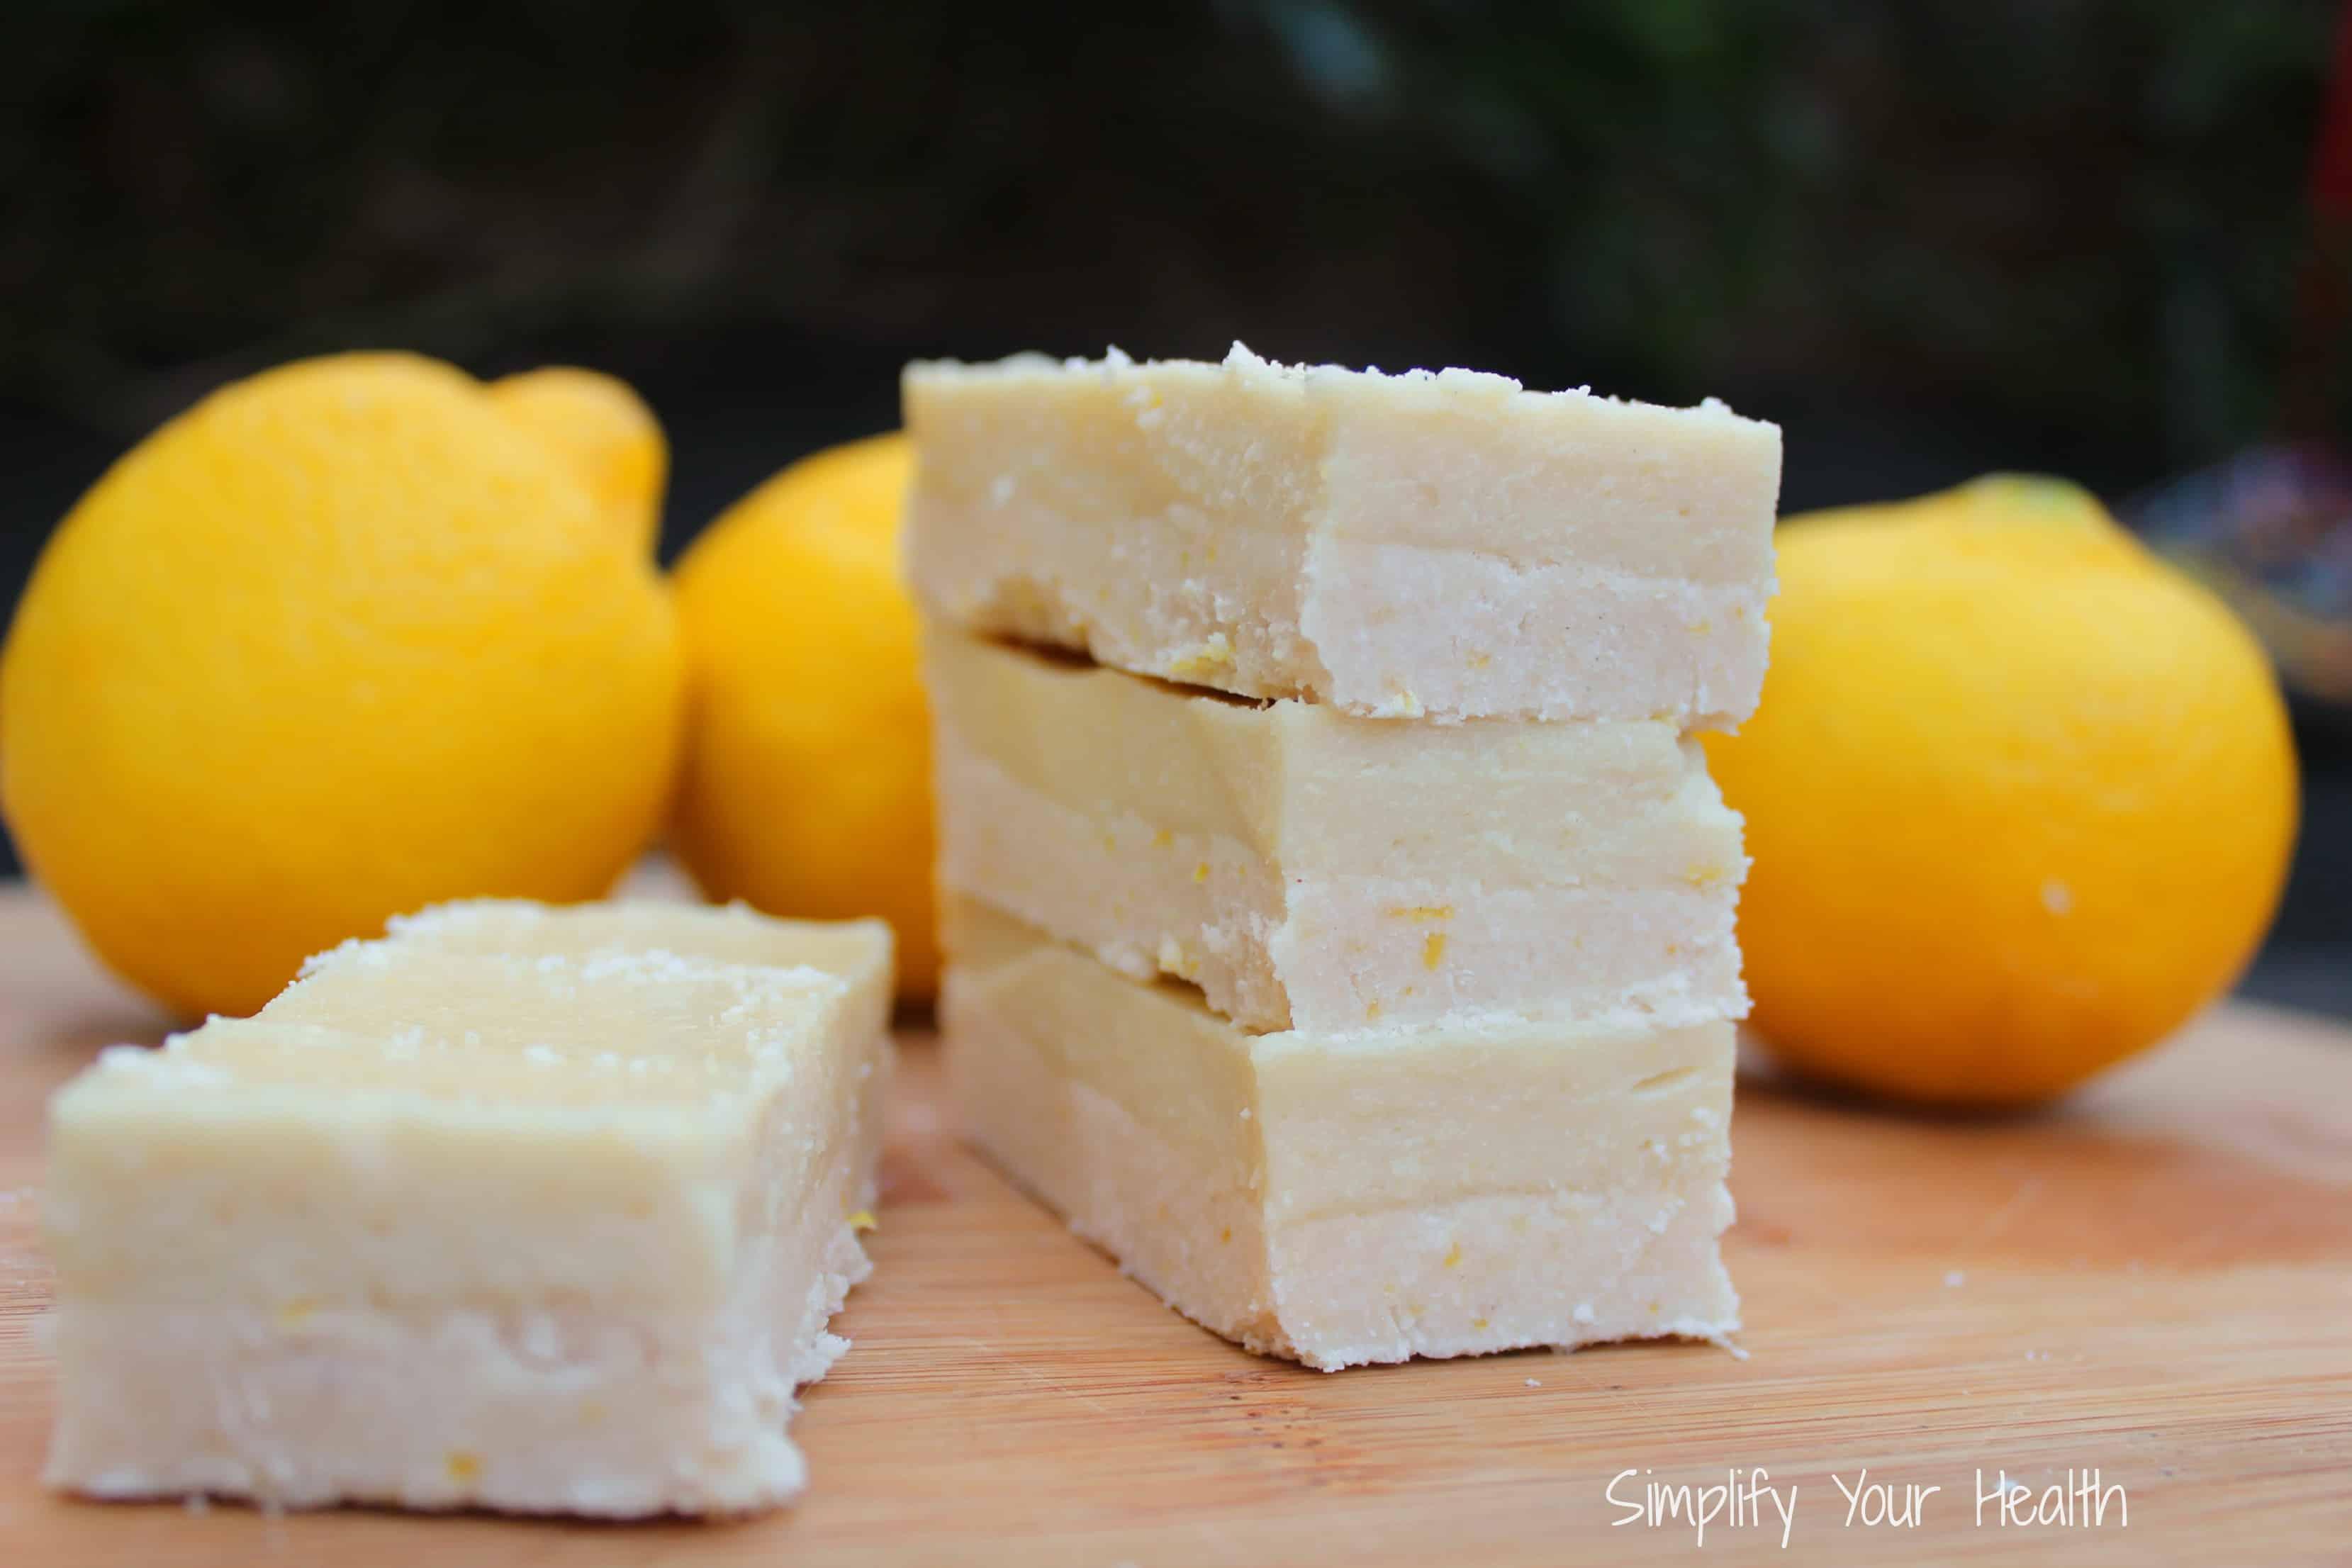 Best coconut flour recipes - Lemon bars by Simplify Your Health